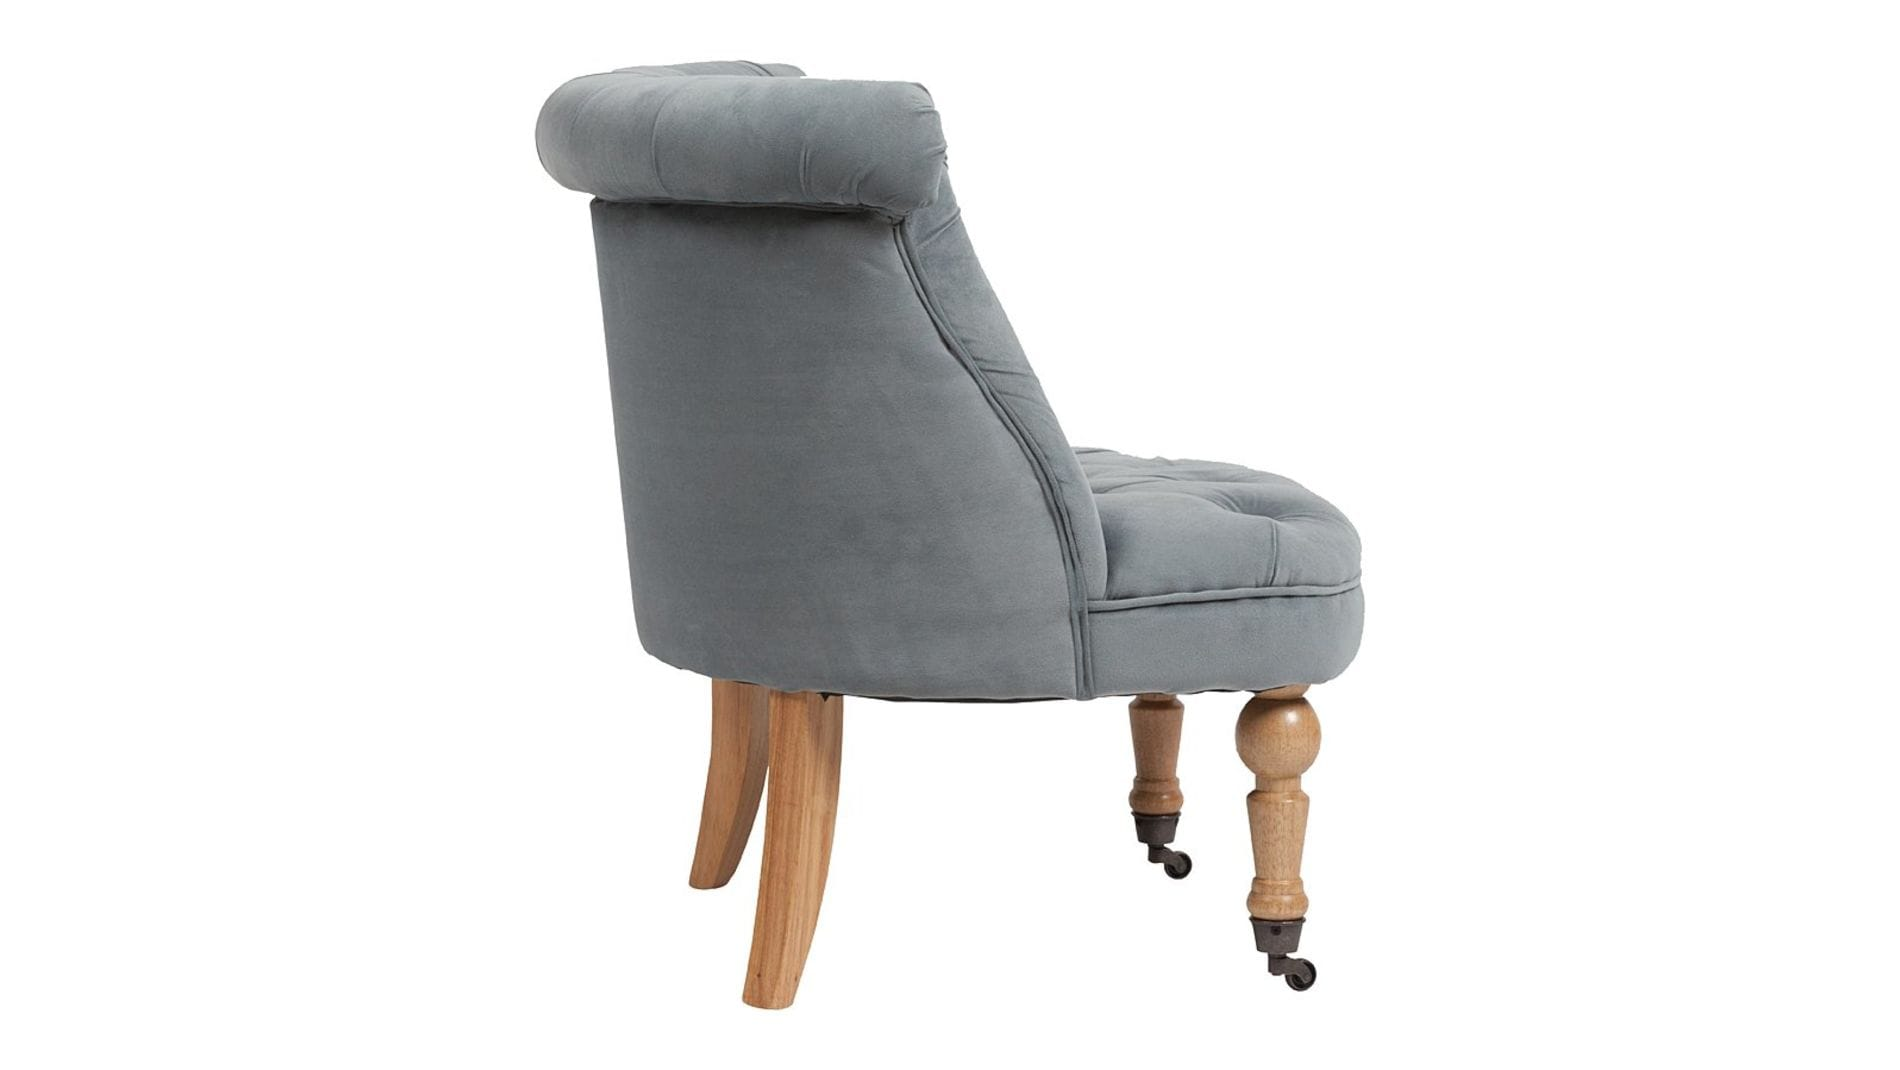 Кресло Amelie French Country Chair Серо-синий Вельвет М